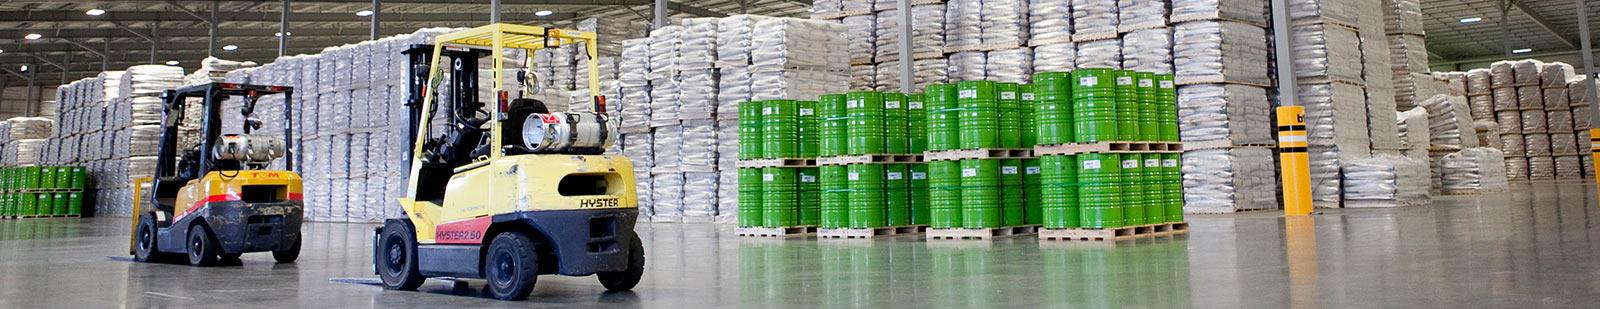 Inside a warehouse at Izone